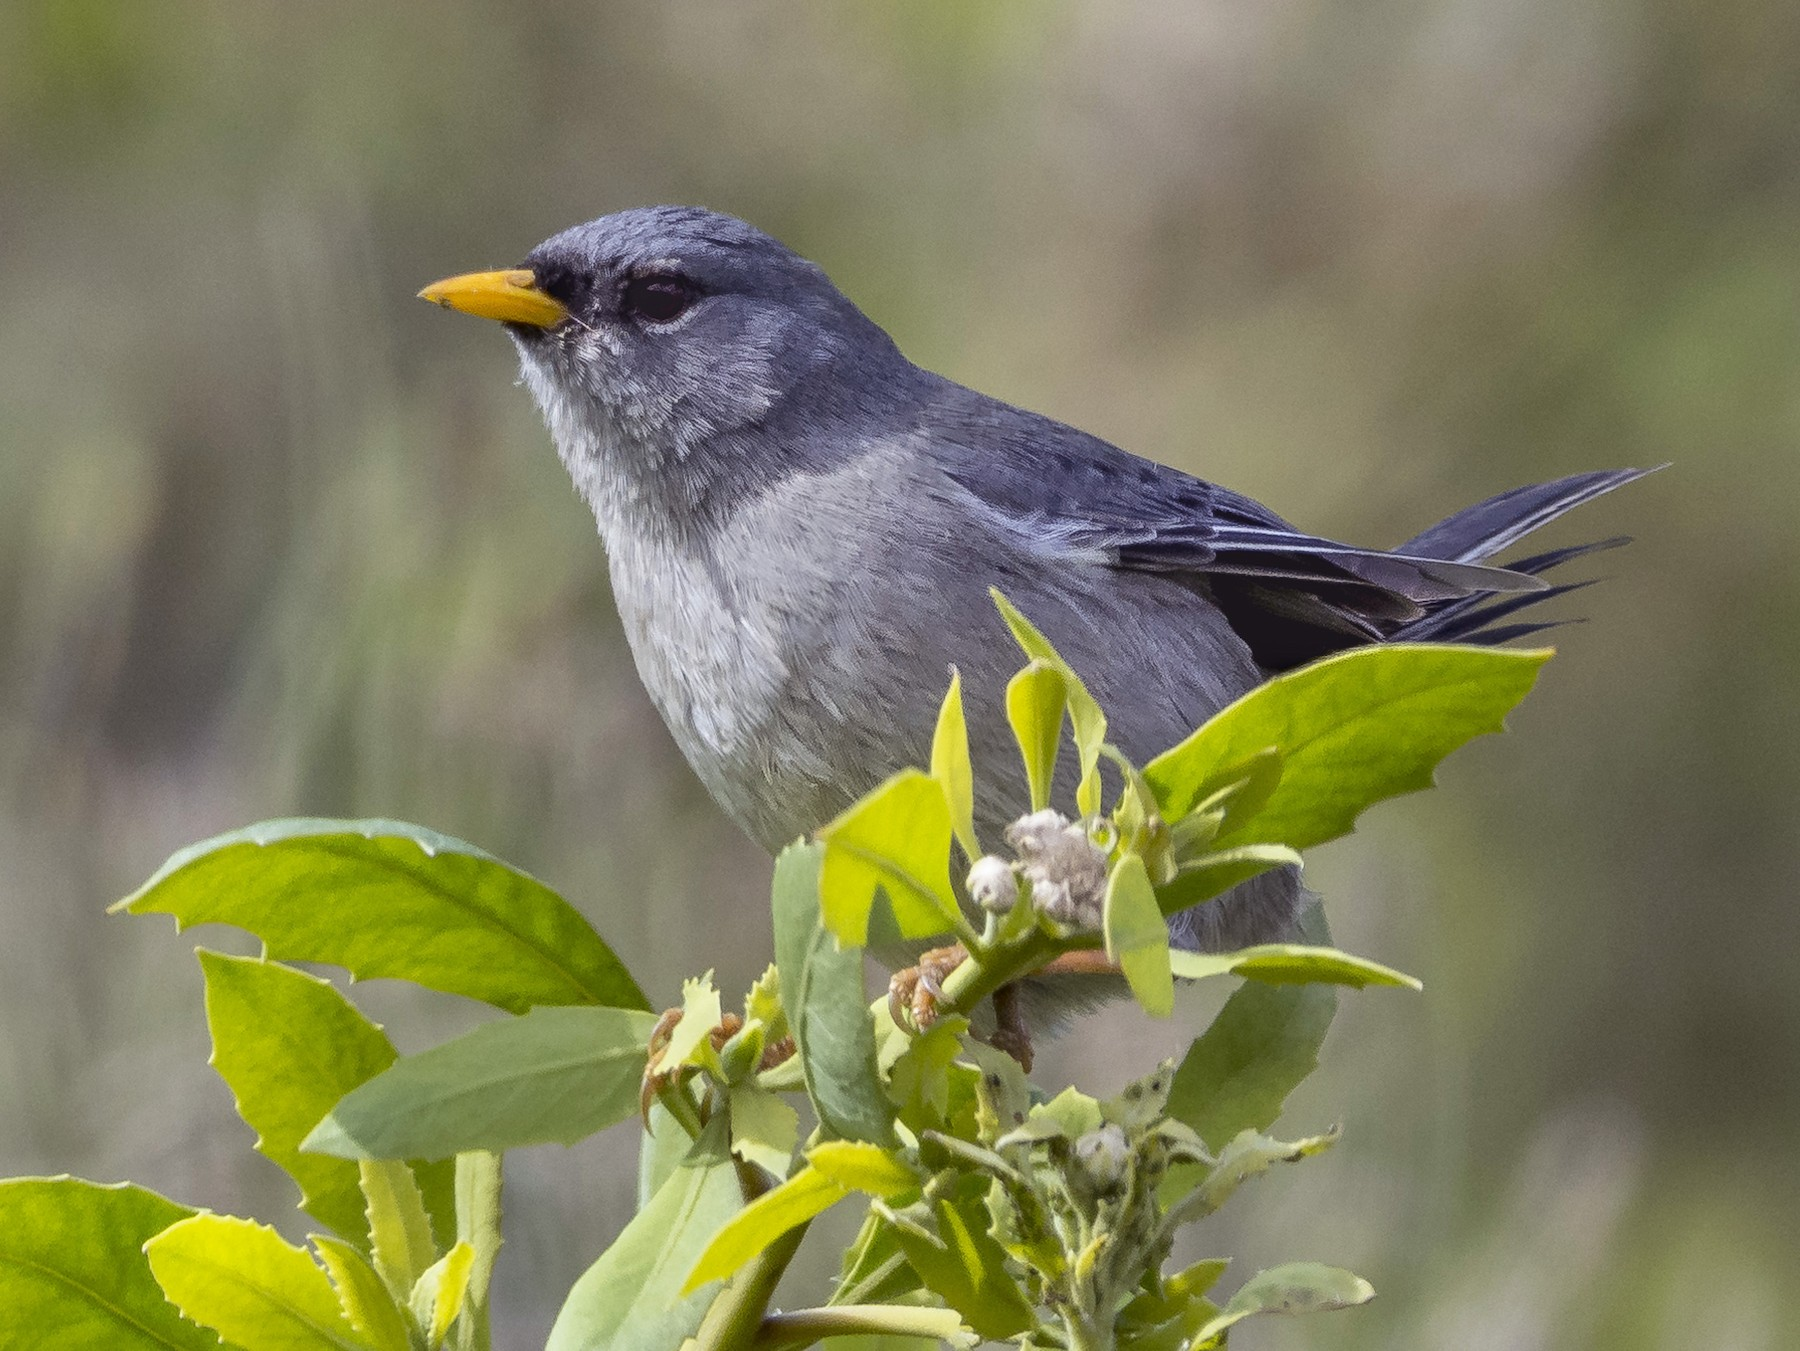 Slender-billed Finch - VERONICA ARAYA GARCIA